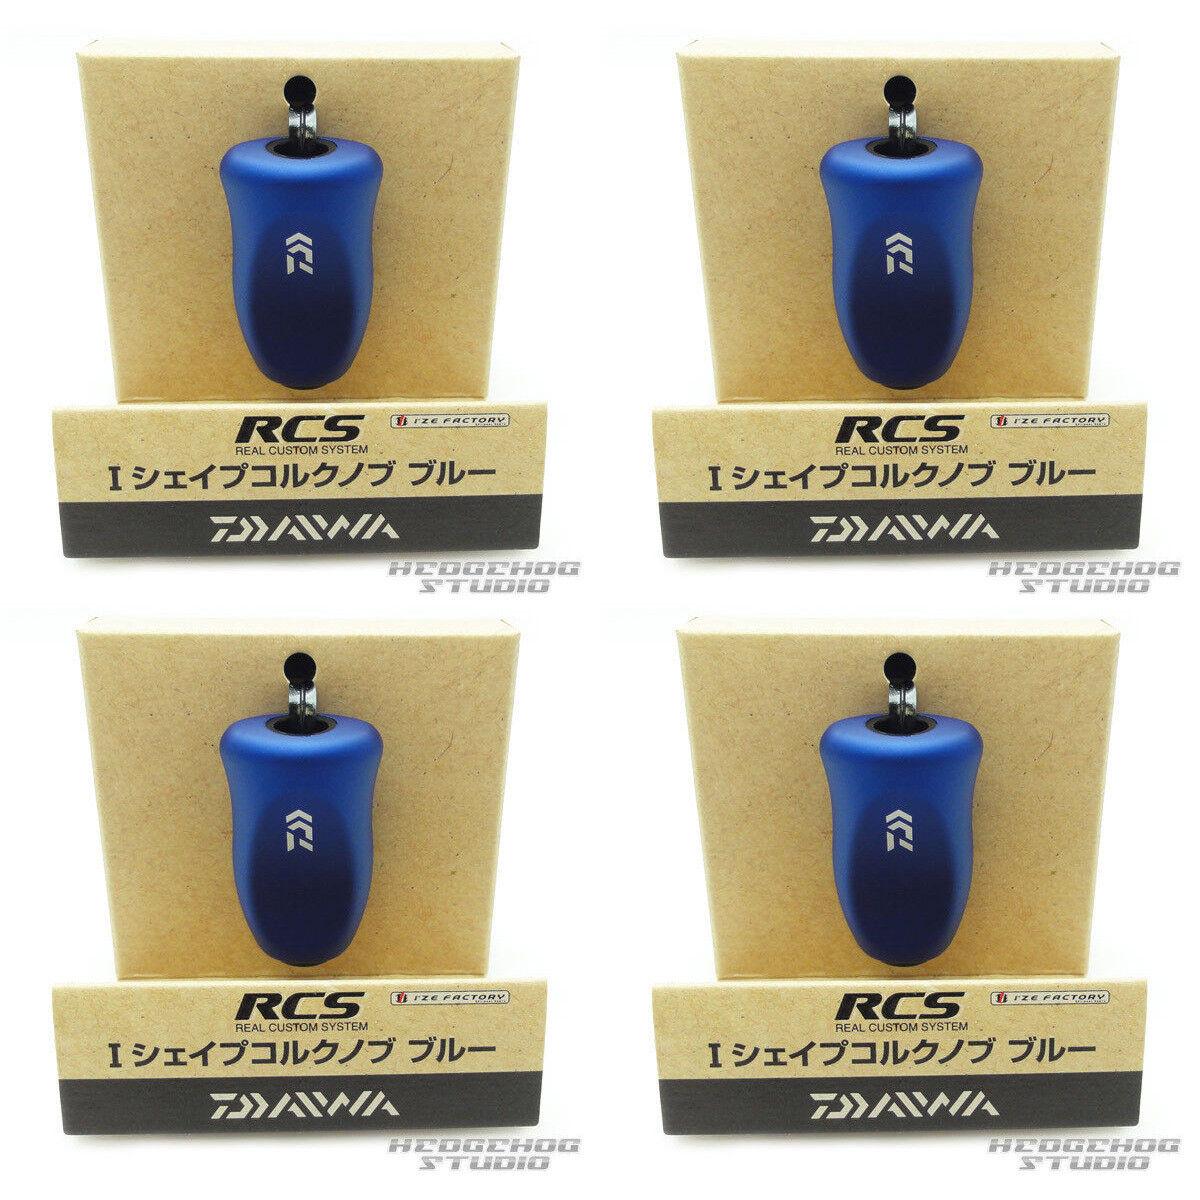 DAIWA Genuine SLP WORKS RCS I Shape Cork Knob - blueE x 4pcs